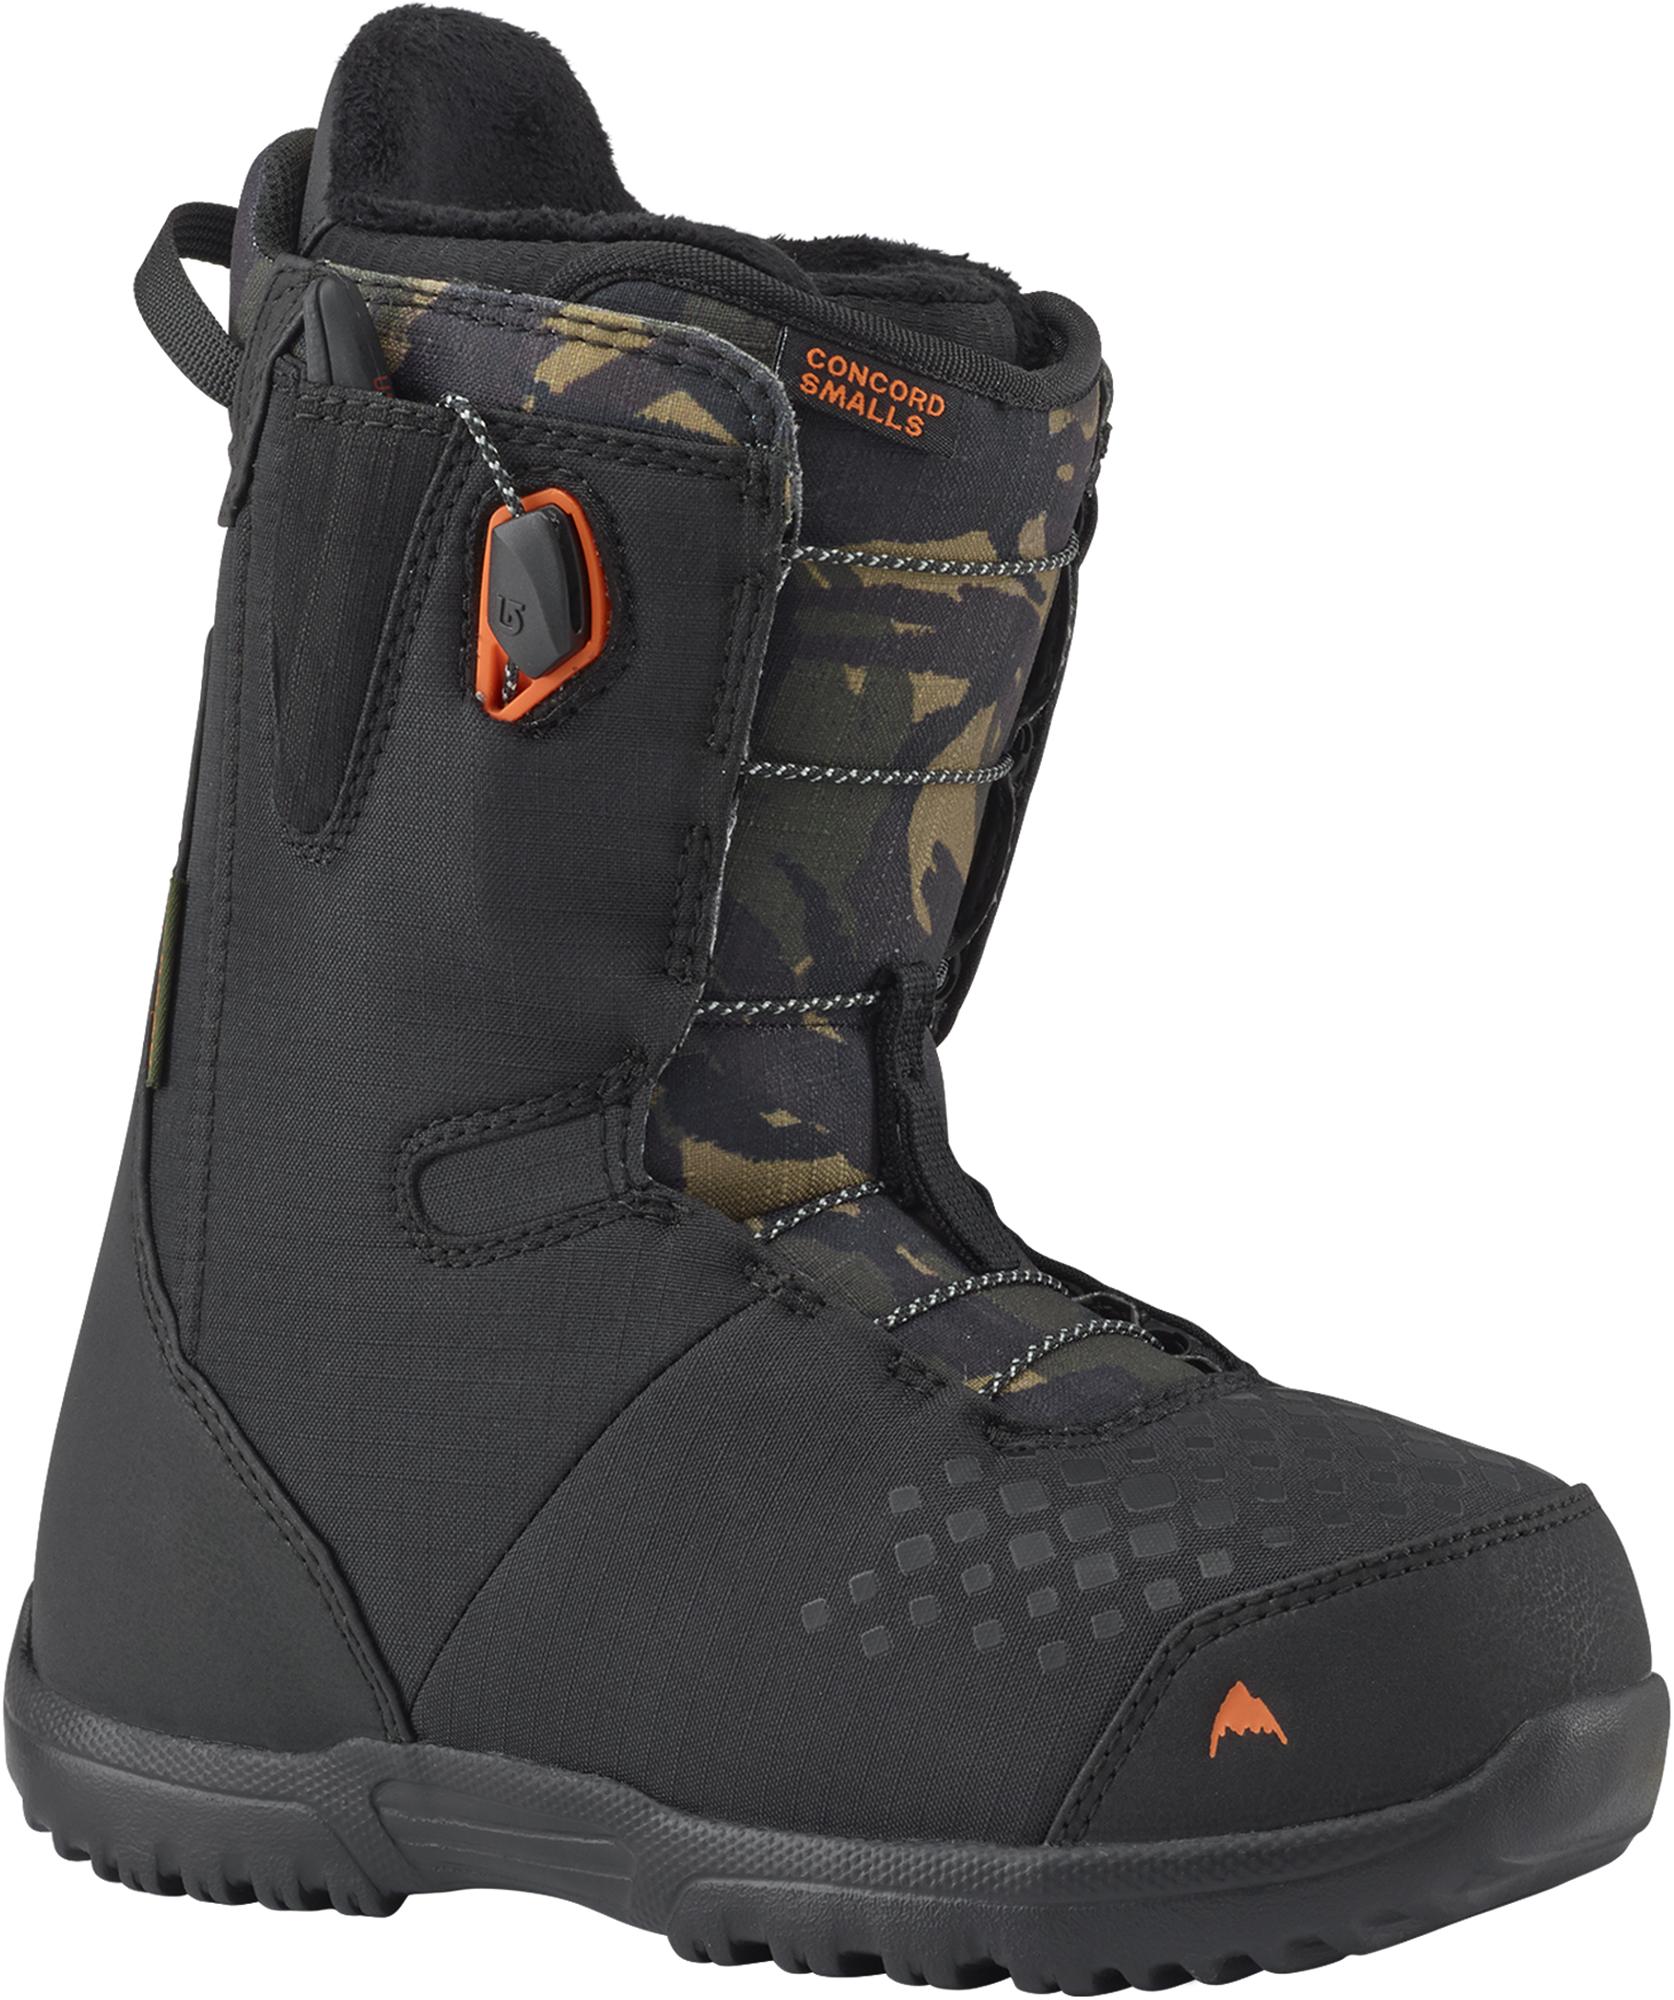 Burton Сноубордические ботинки детские Burton Concord Smalls, размер 34 цена